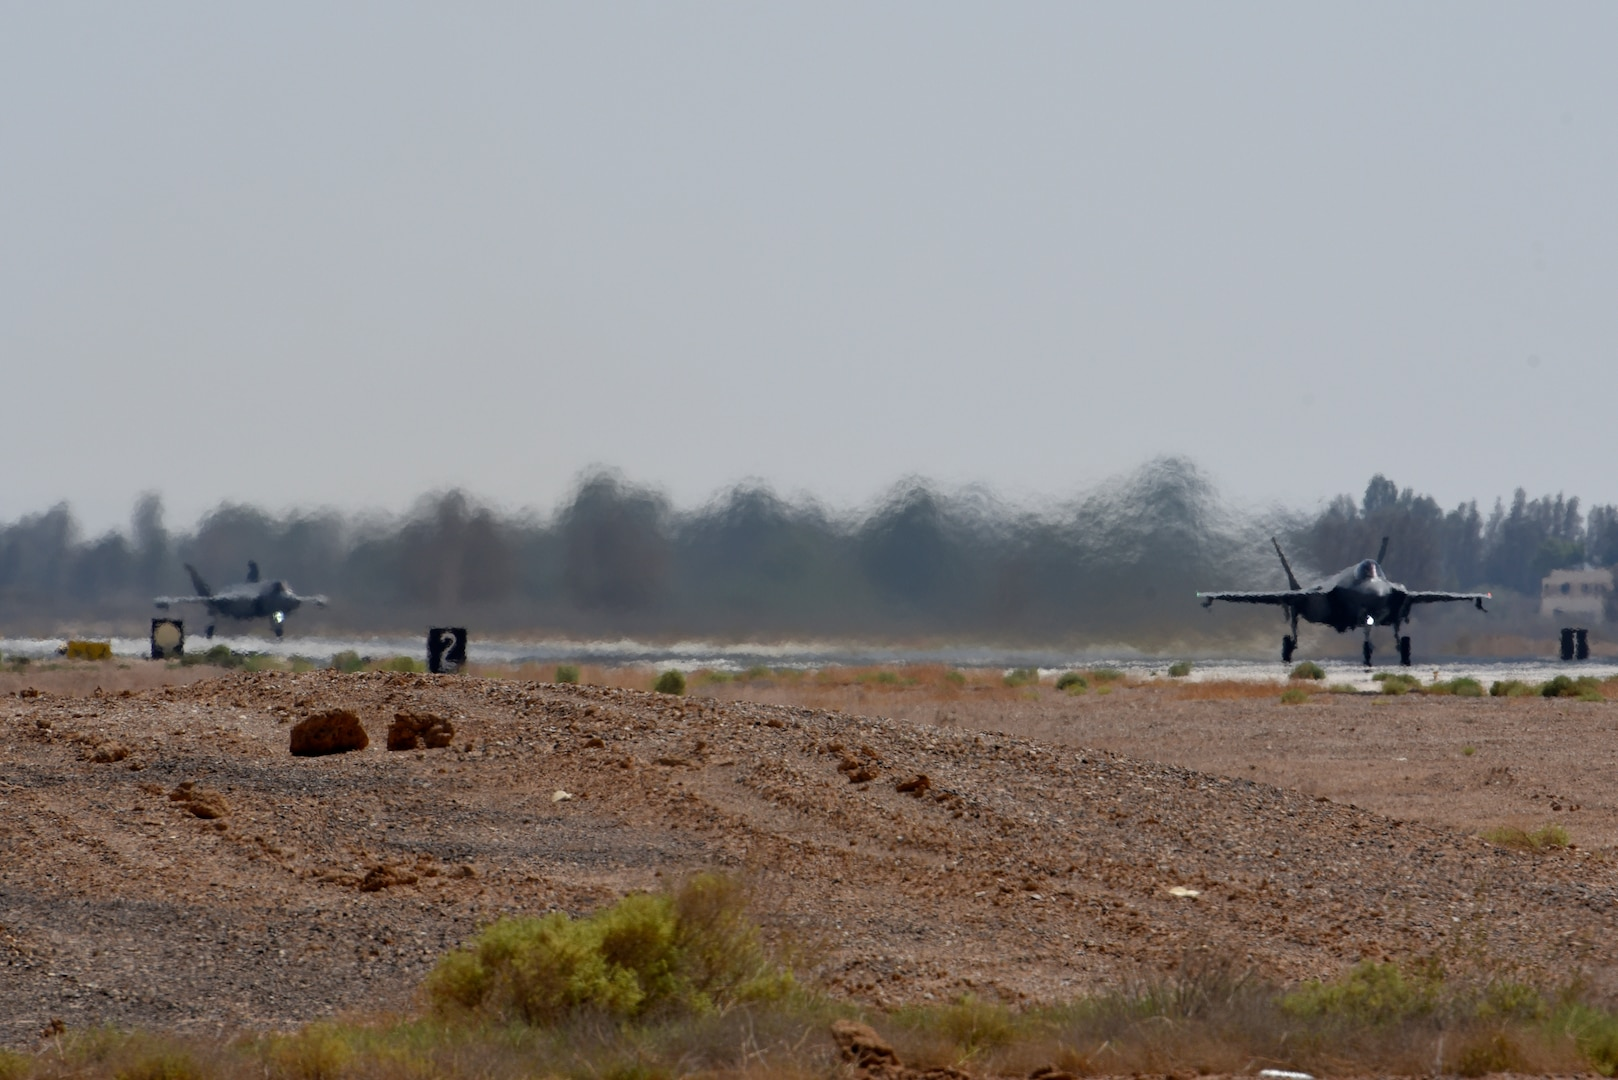 F-35As prepare to takeoff